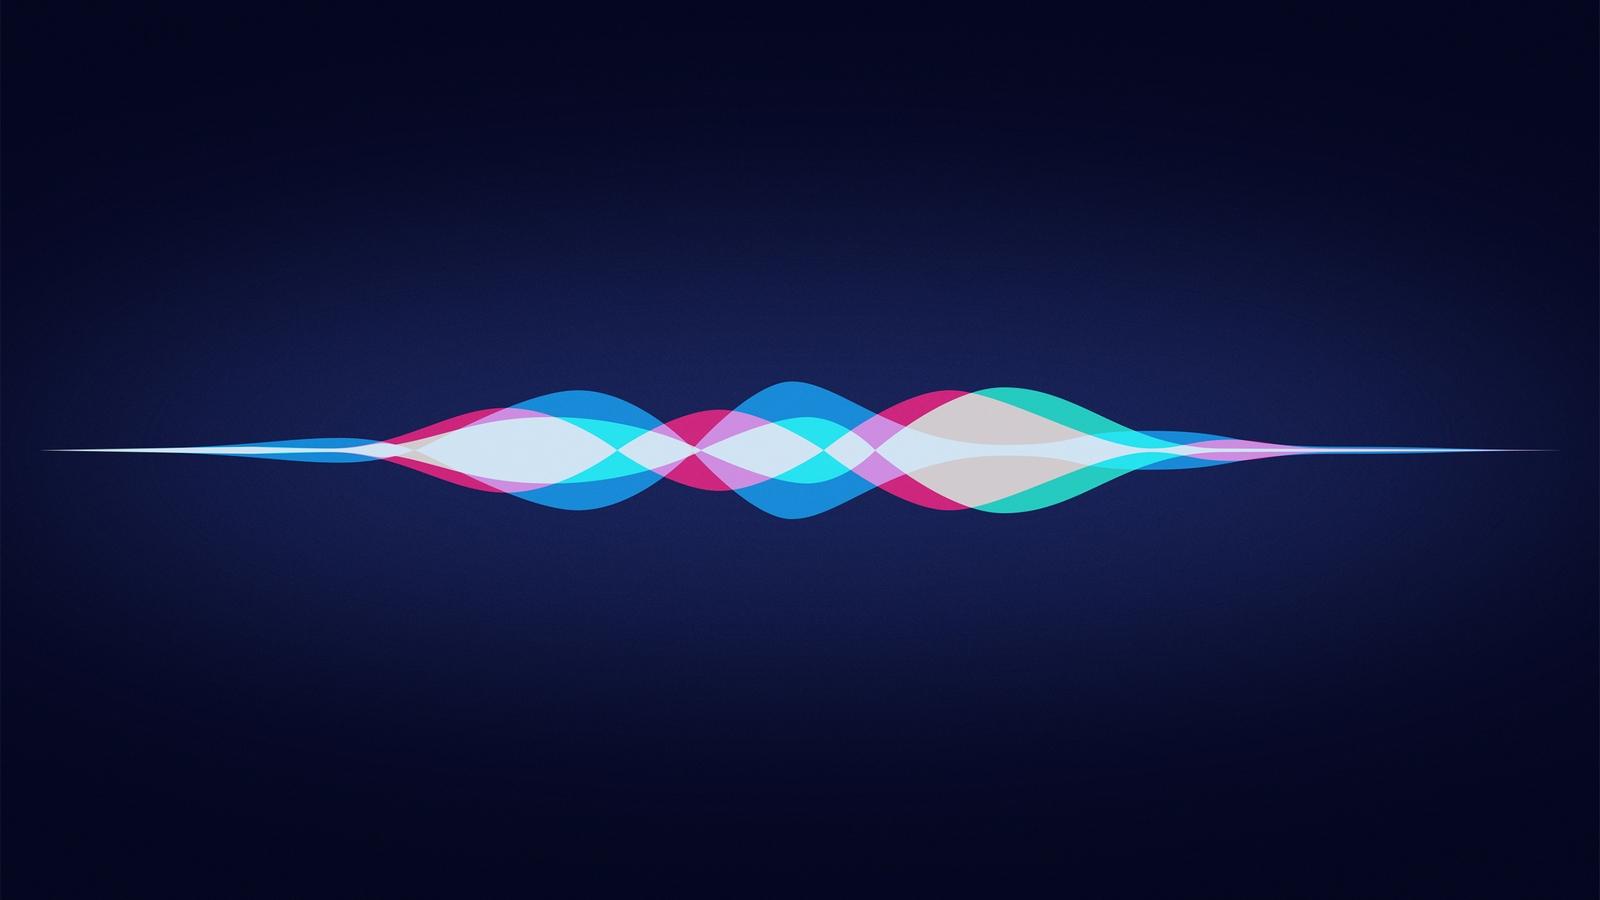 Apple обучит голосового ассистента Siri говорить шепотом